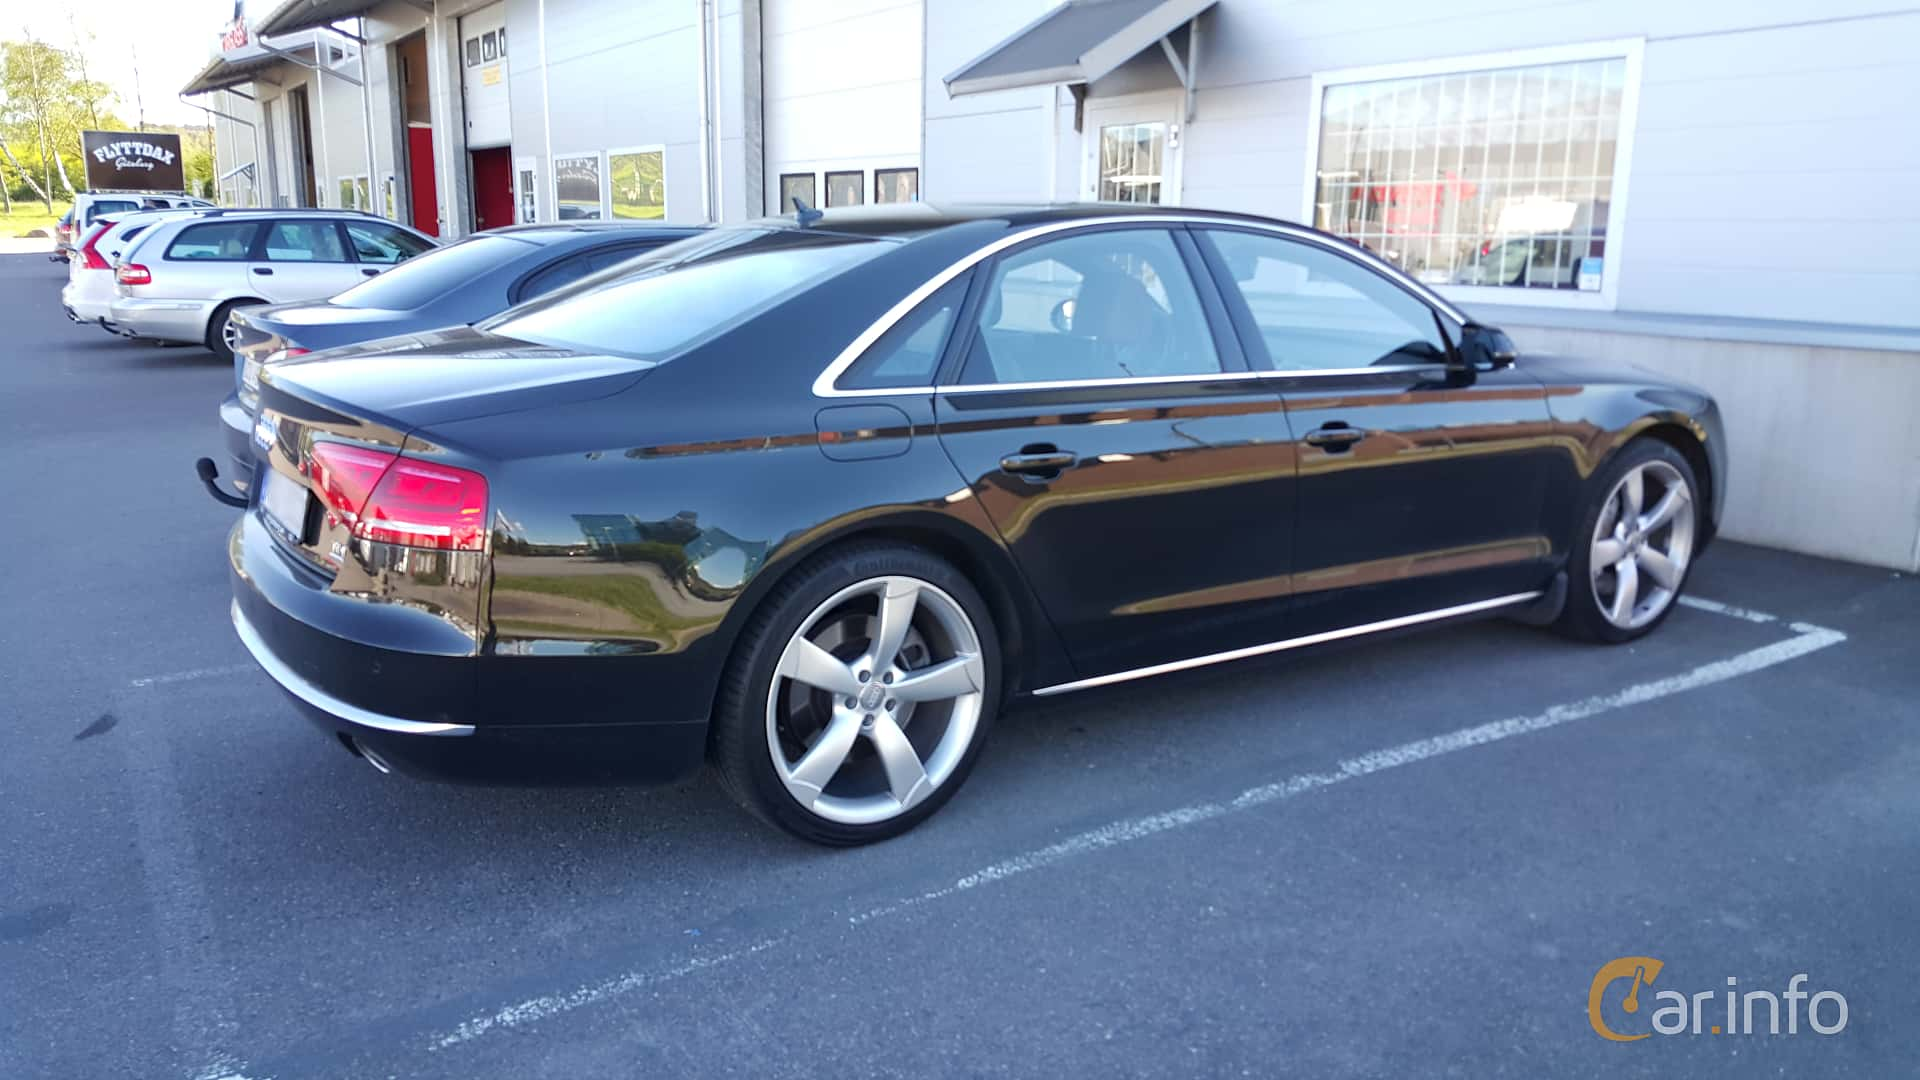 Kekurangan Audi A8 4.2 V8 Top Model Tahun Ini